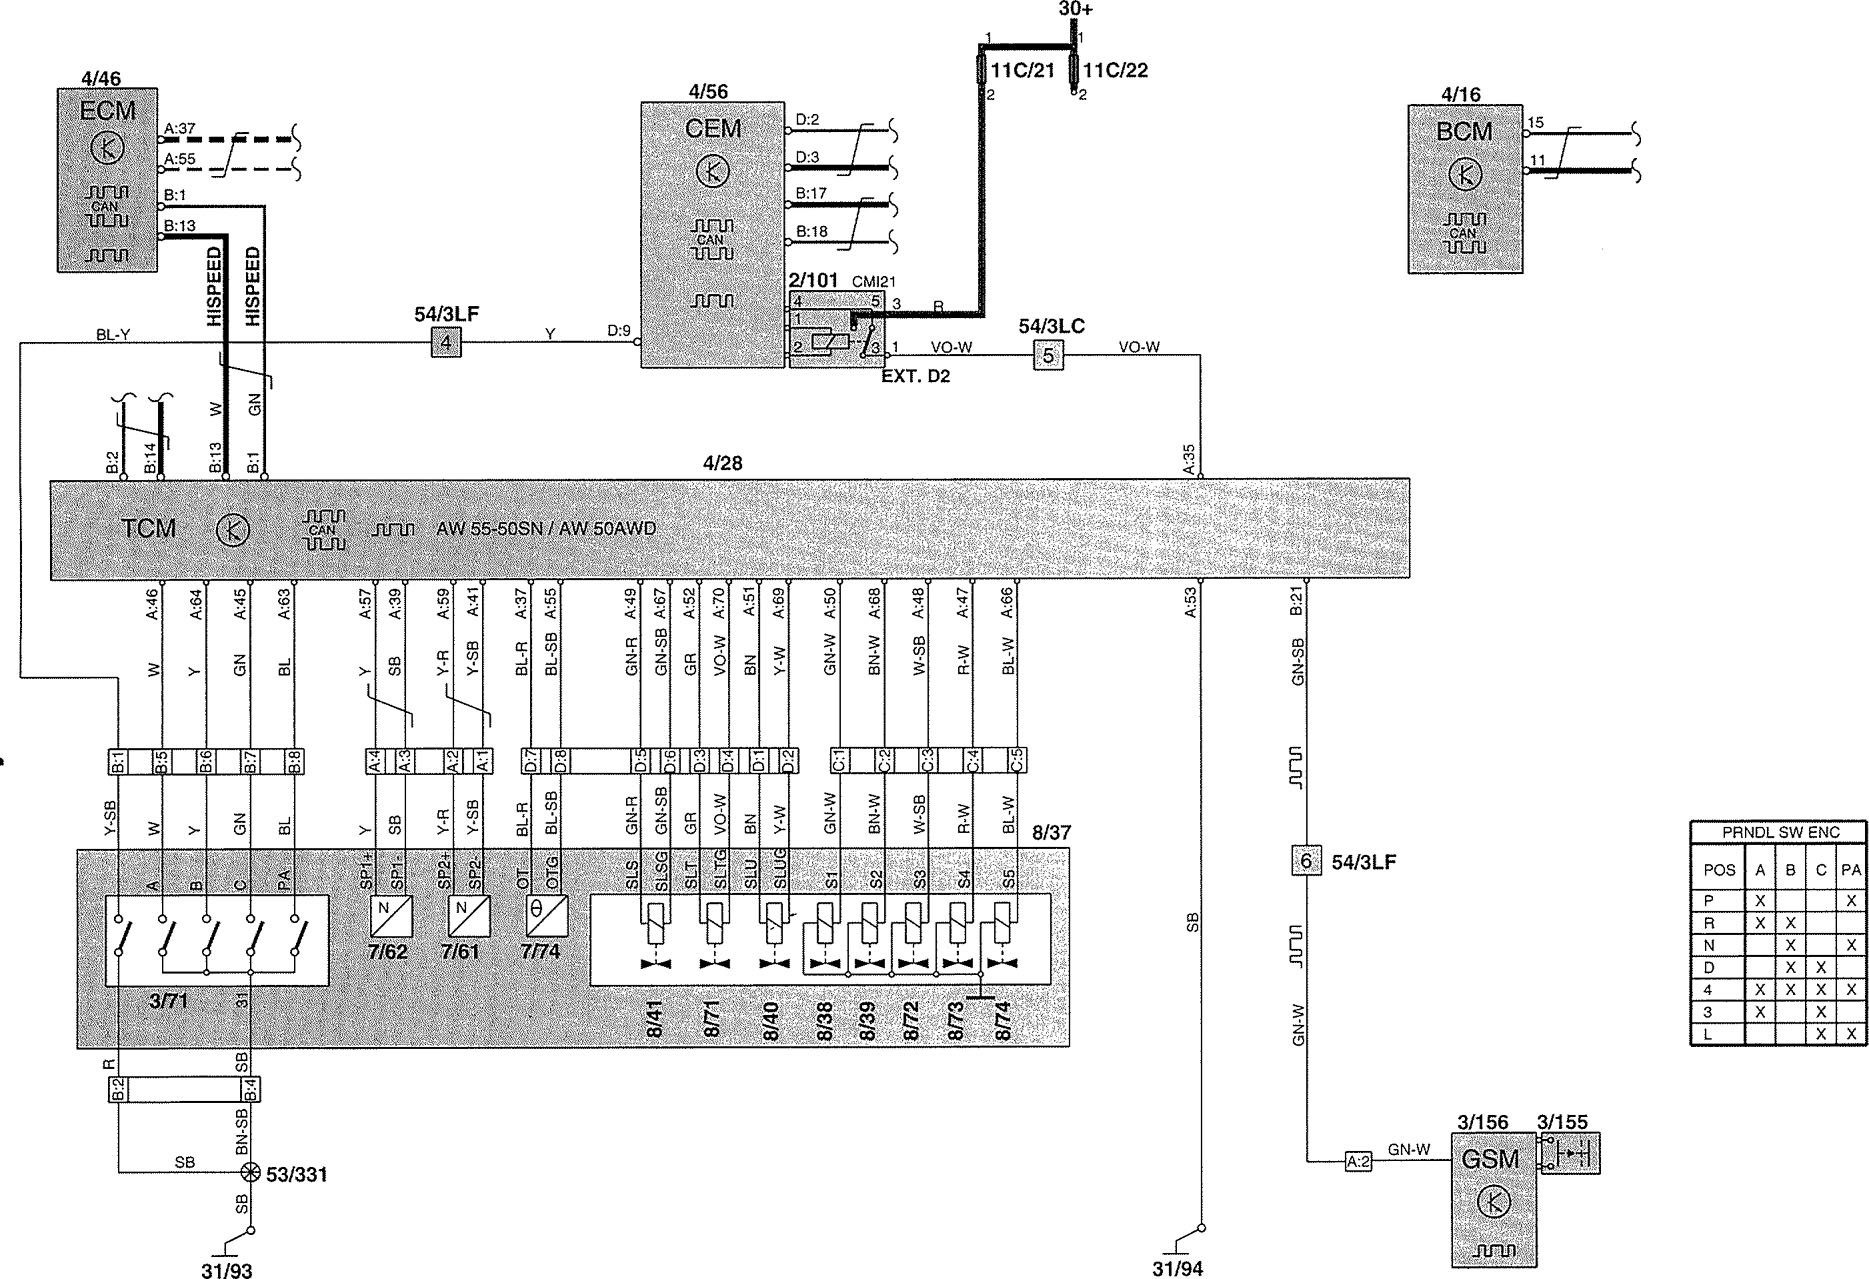 volvo v70 2002 wiring diagrams transmission controls 2001 volvo v70 xc wiring diagram